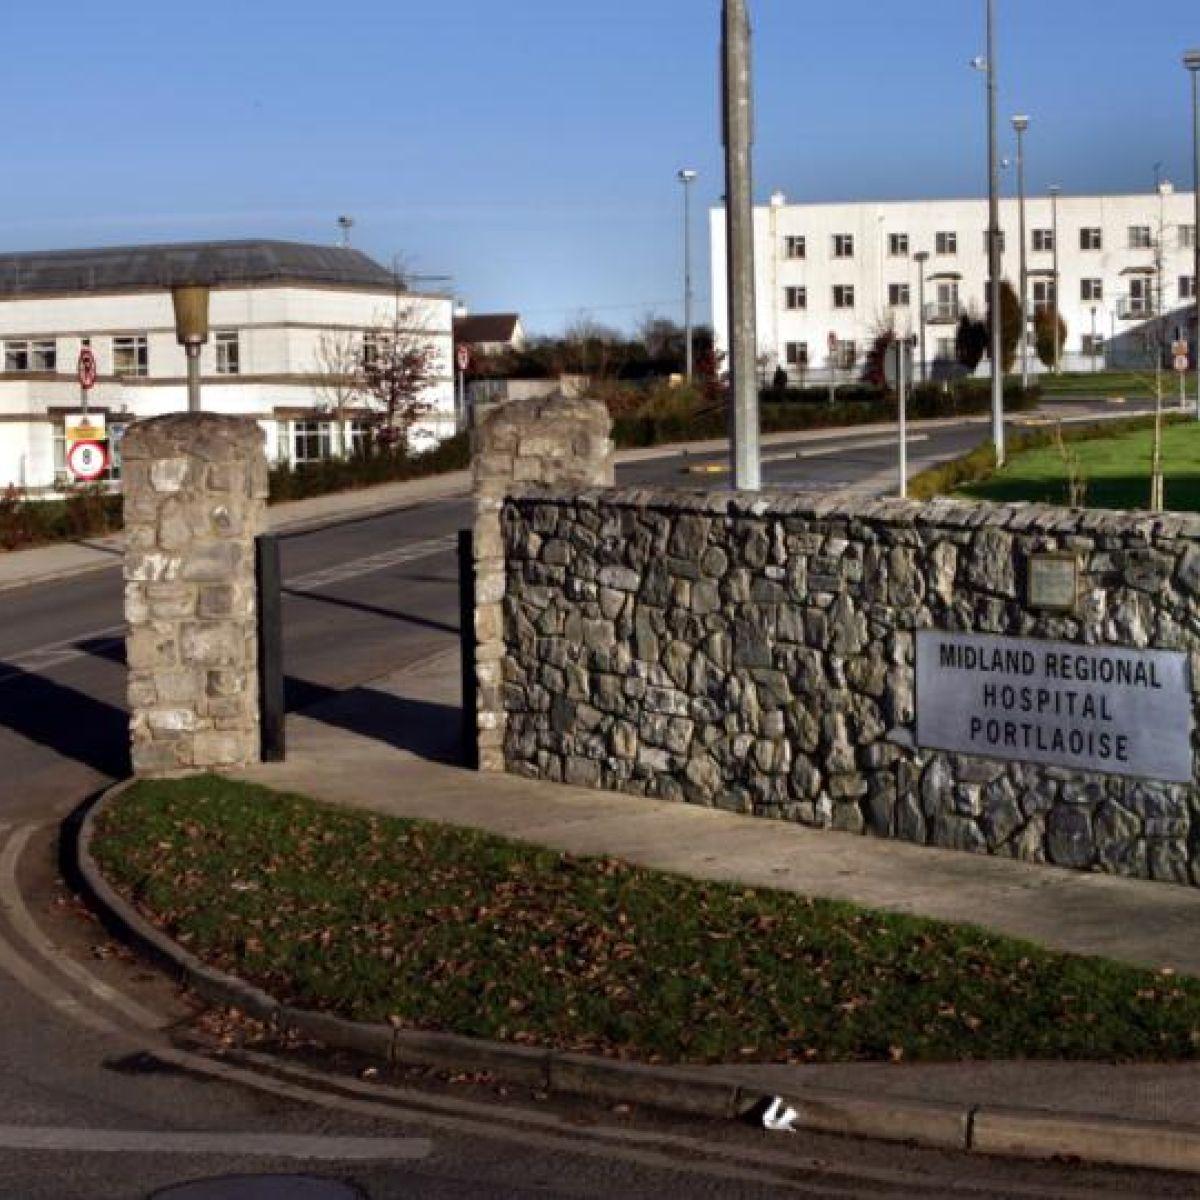 Maldron Hotel Portlaoise, Ireland - sil0.co.uk